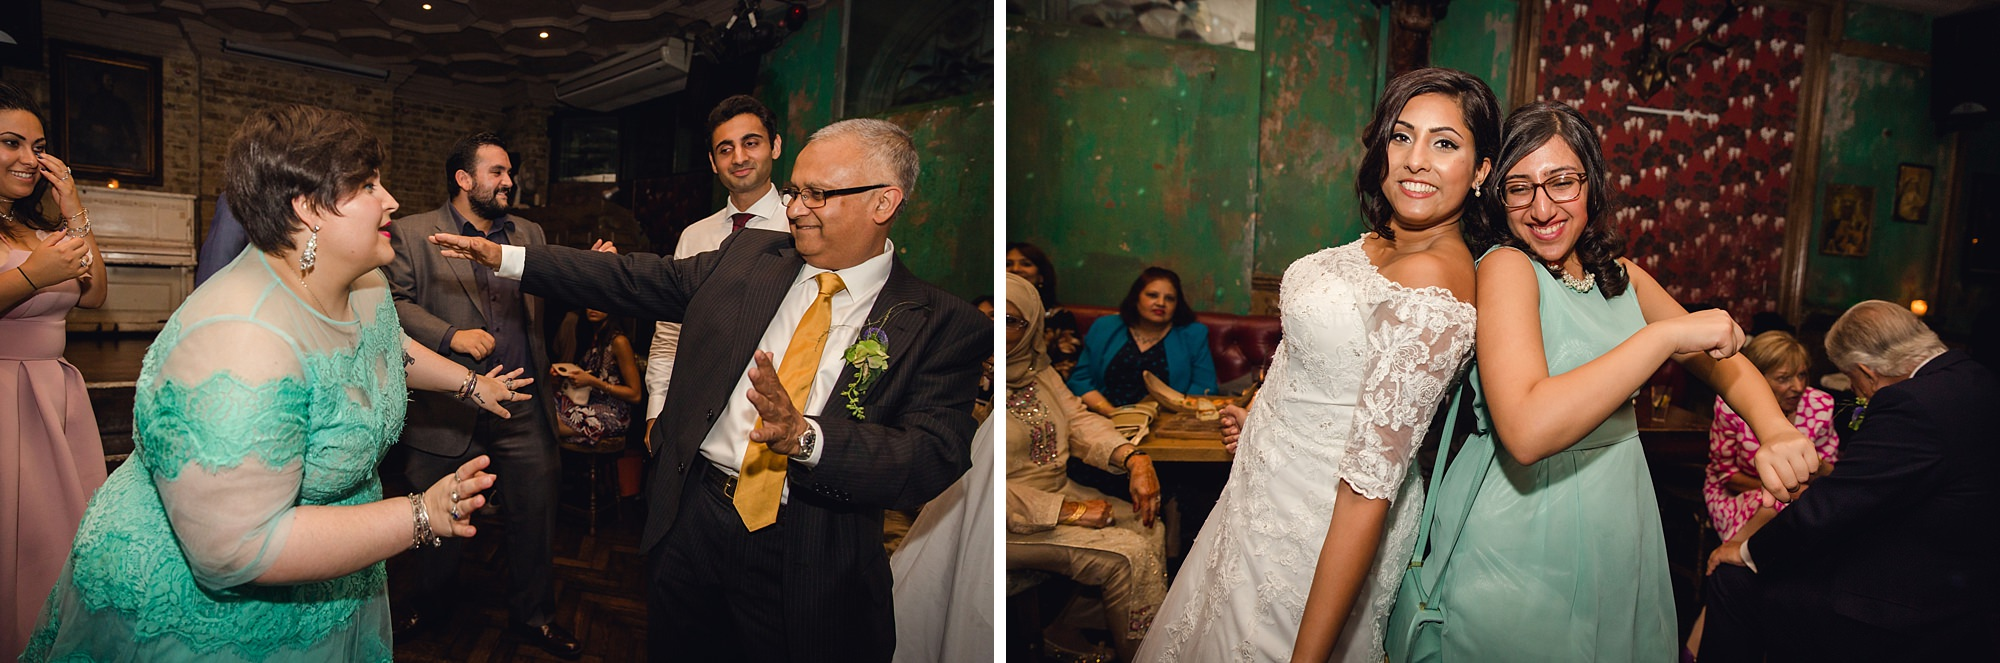 Paradise by way of Kensal Green wedding fun dancing